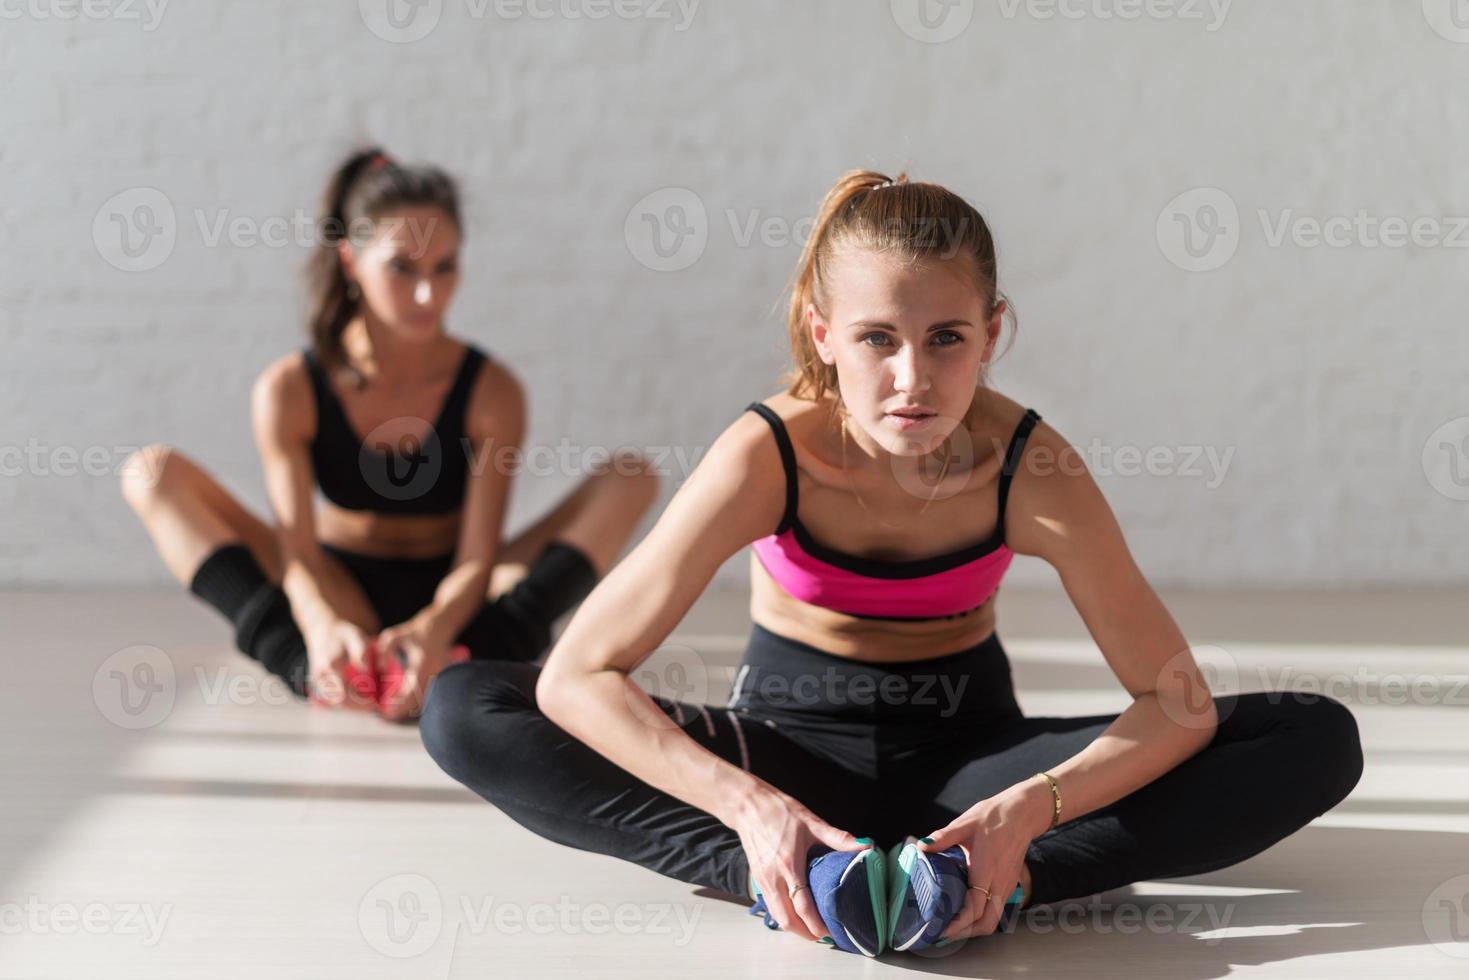 twee fit meisjes doen rekoefening samen zittend op de foto